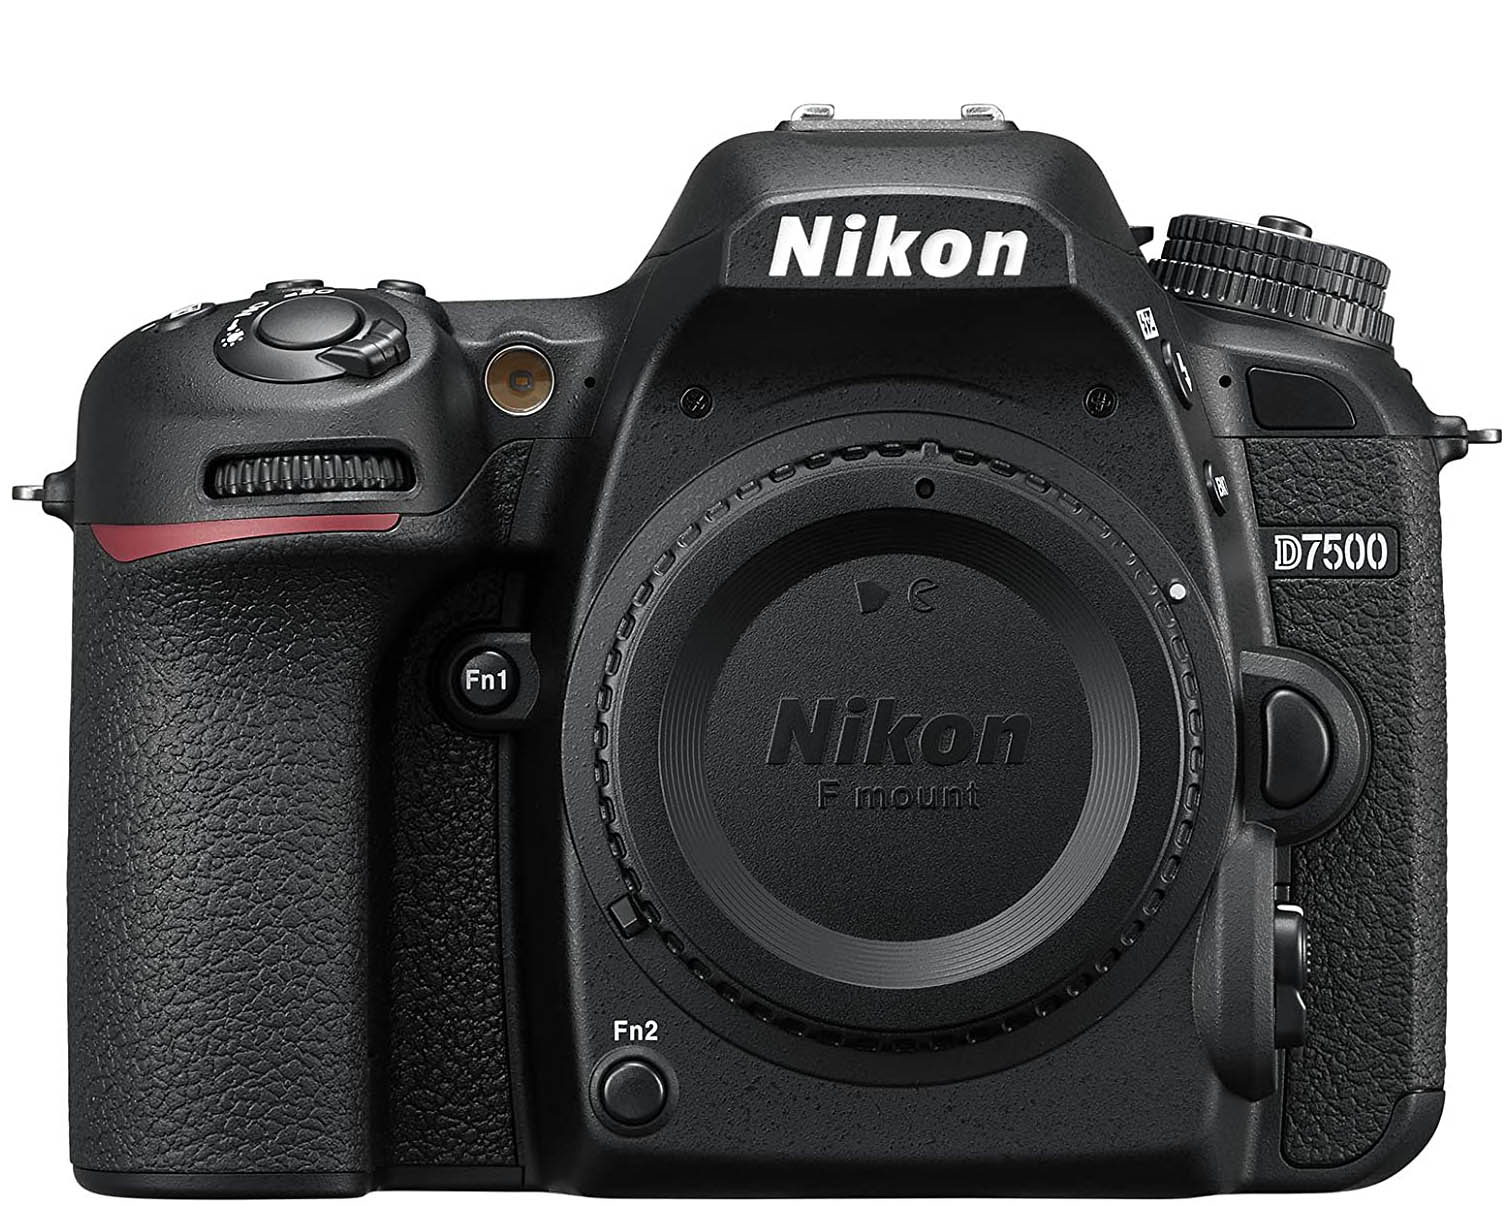 Nikon D7500 - base de datos